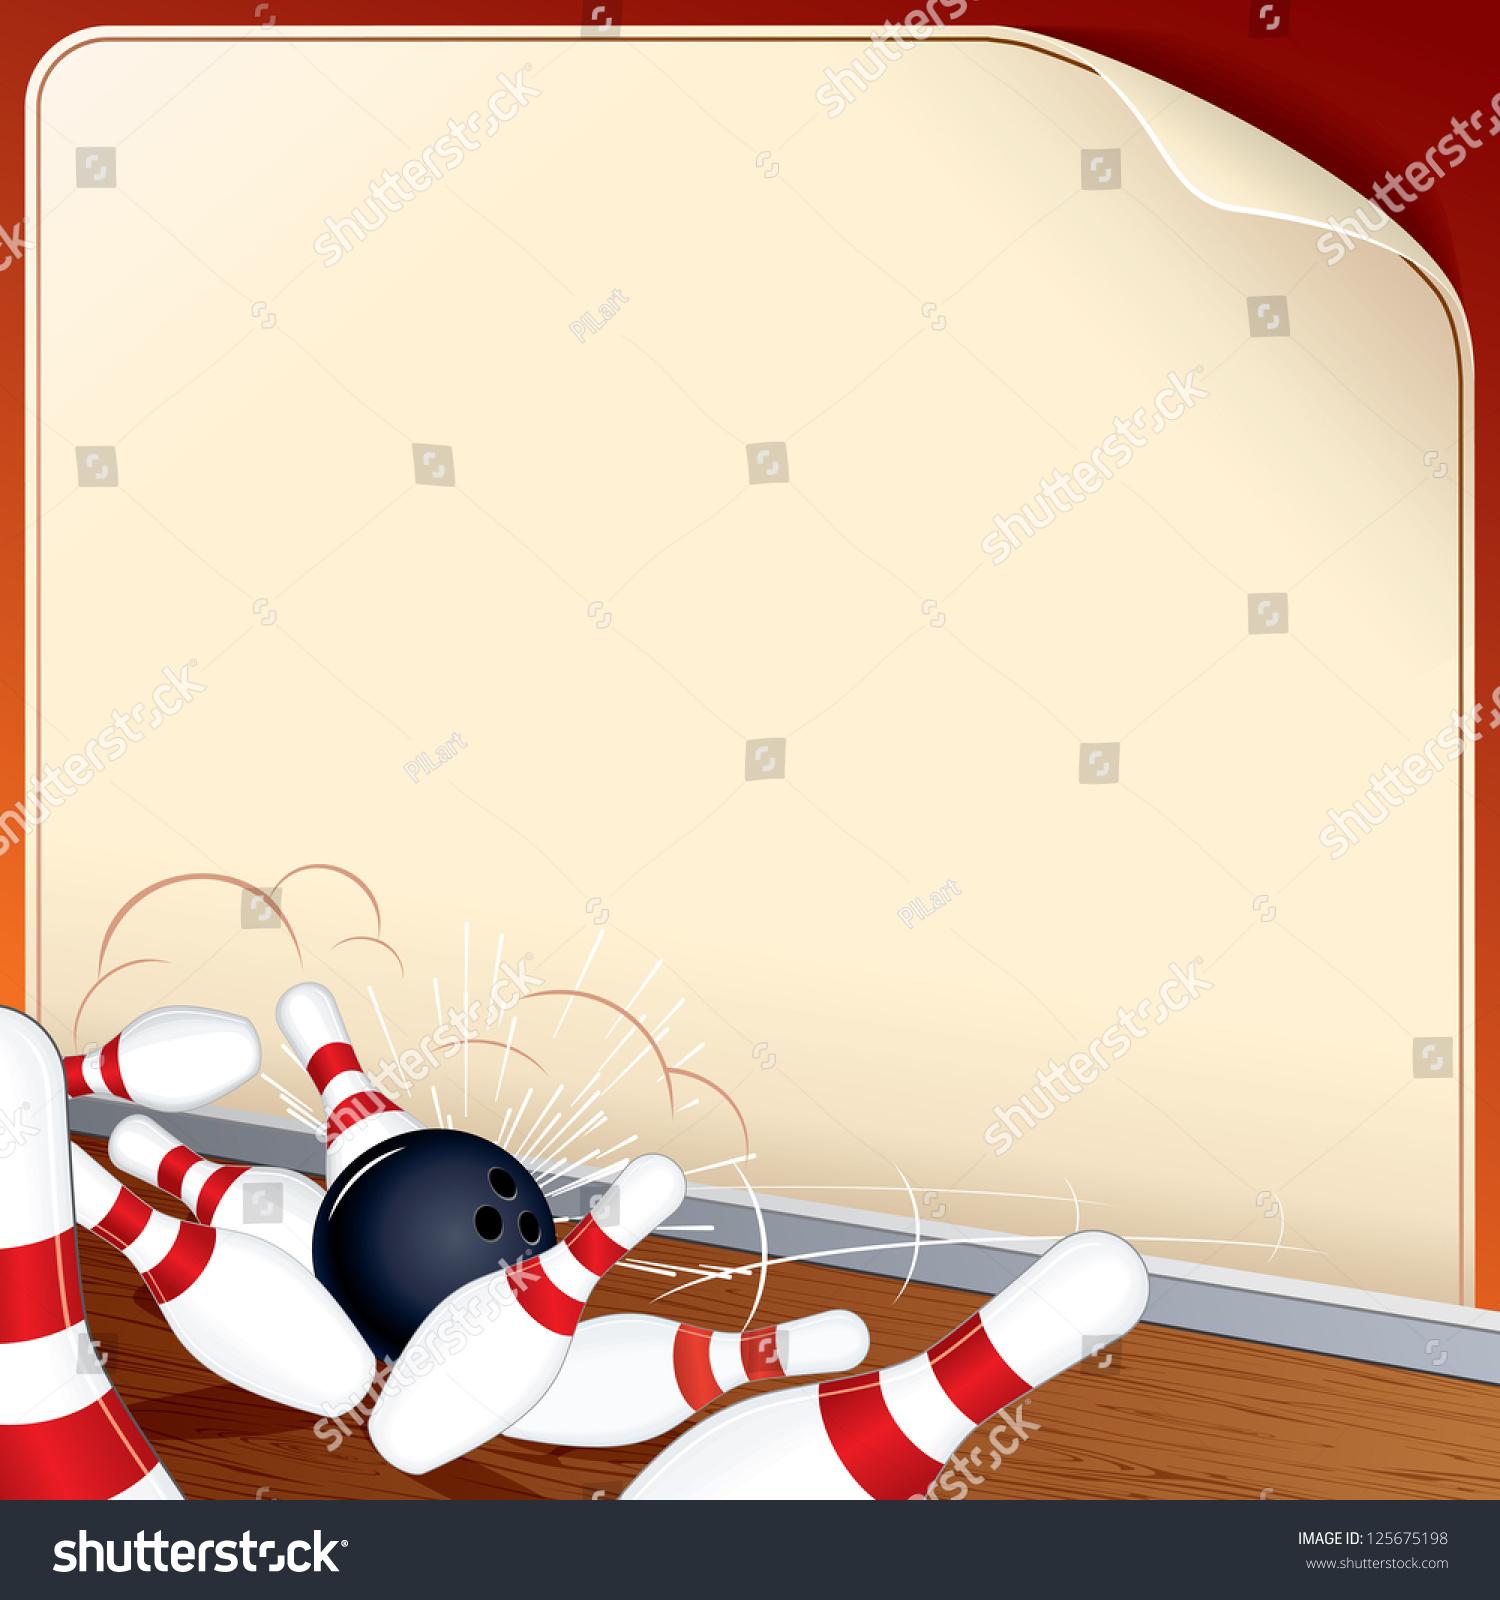 Ten Pin Bowling Background Stock Illustration 125675198